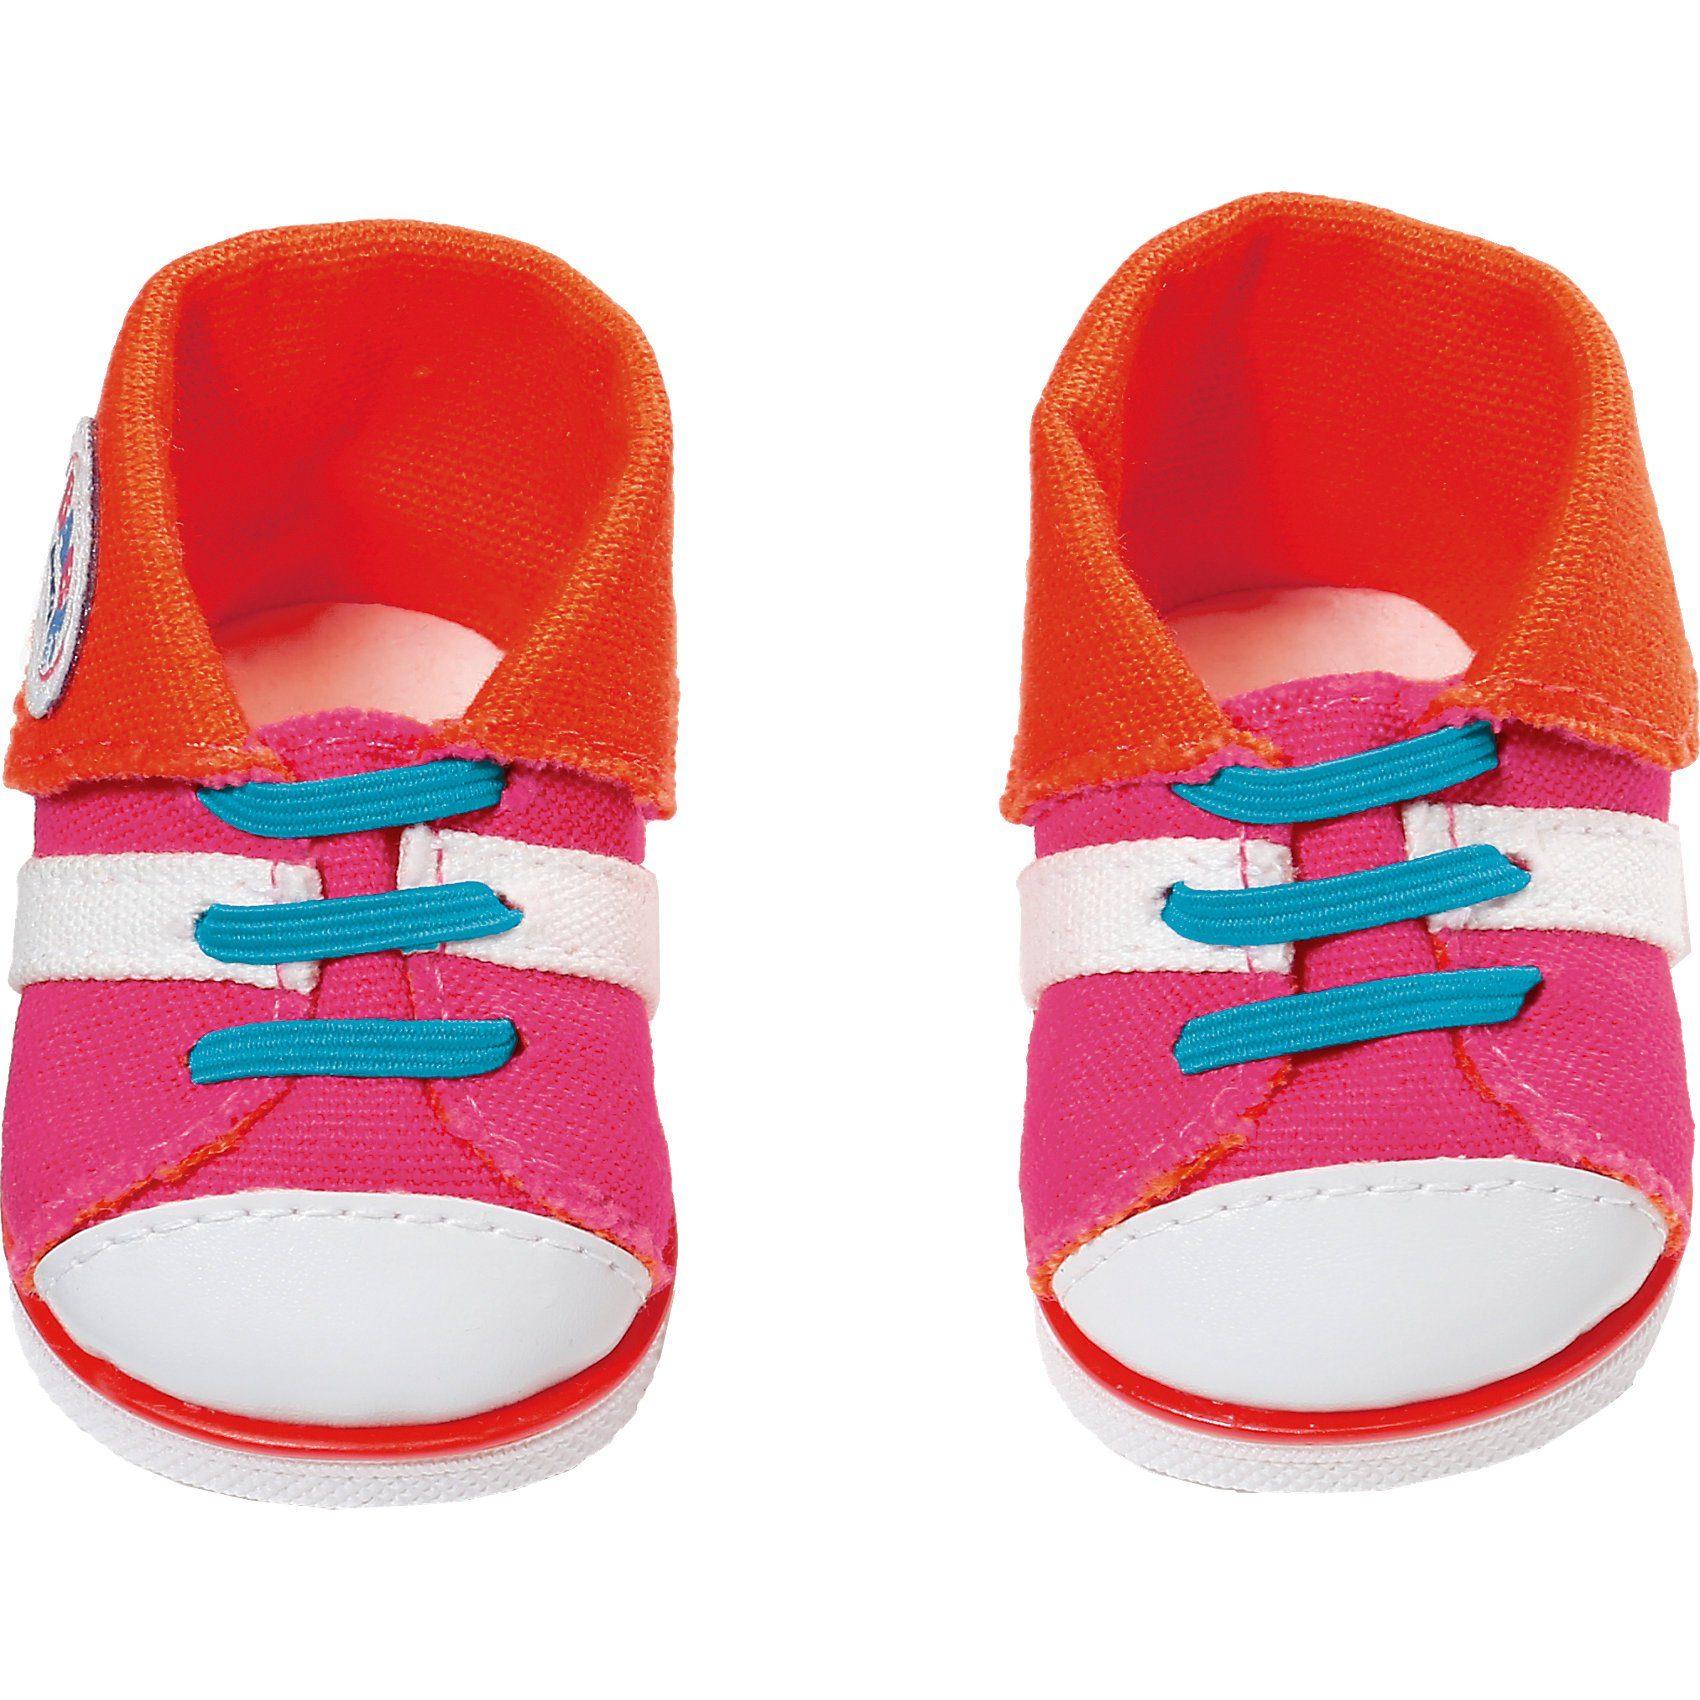 Zapf Creation® BABY born® Chucks pink